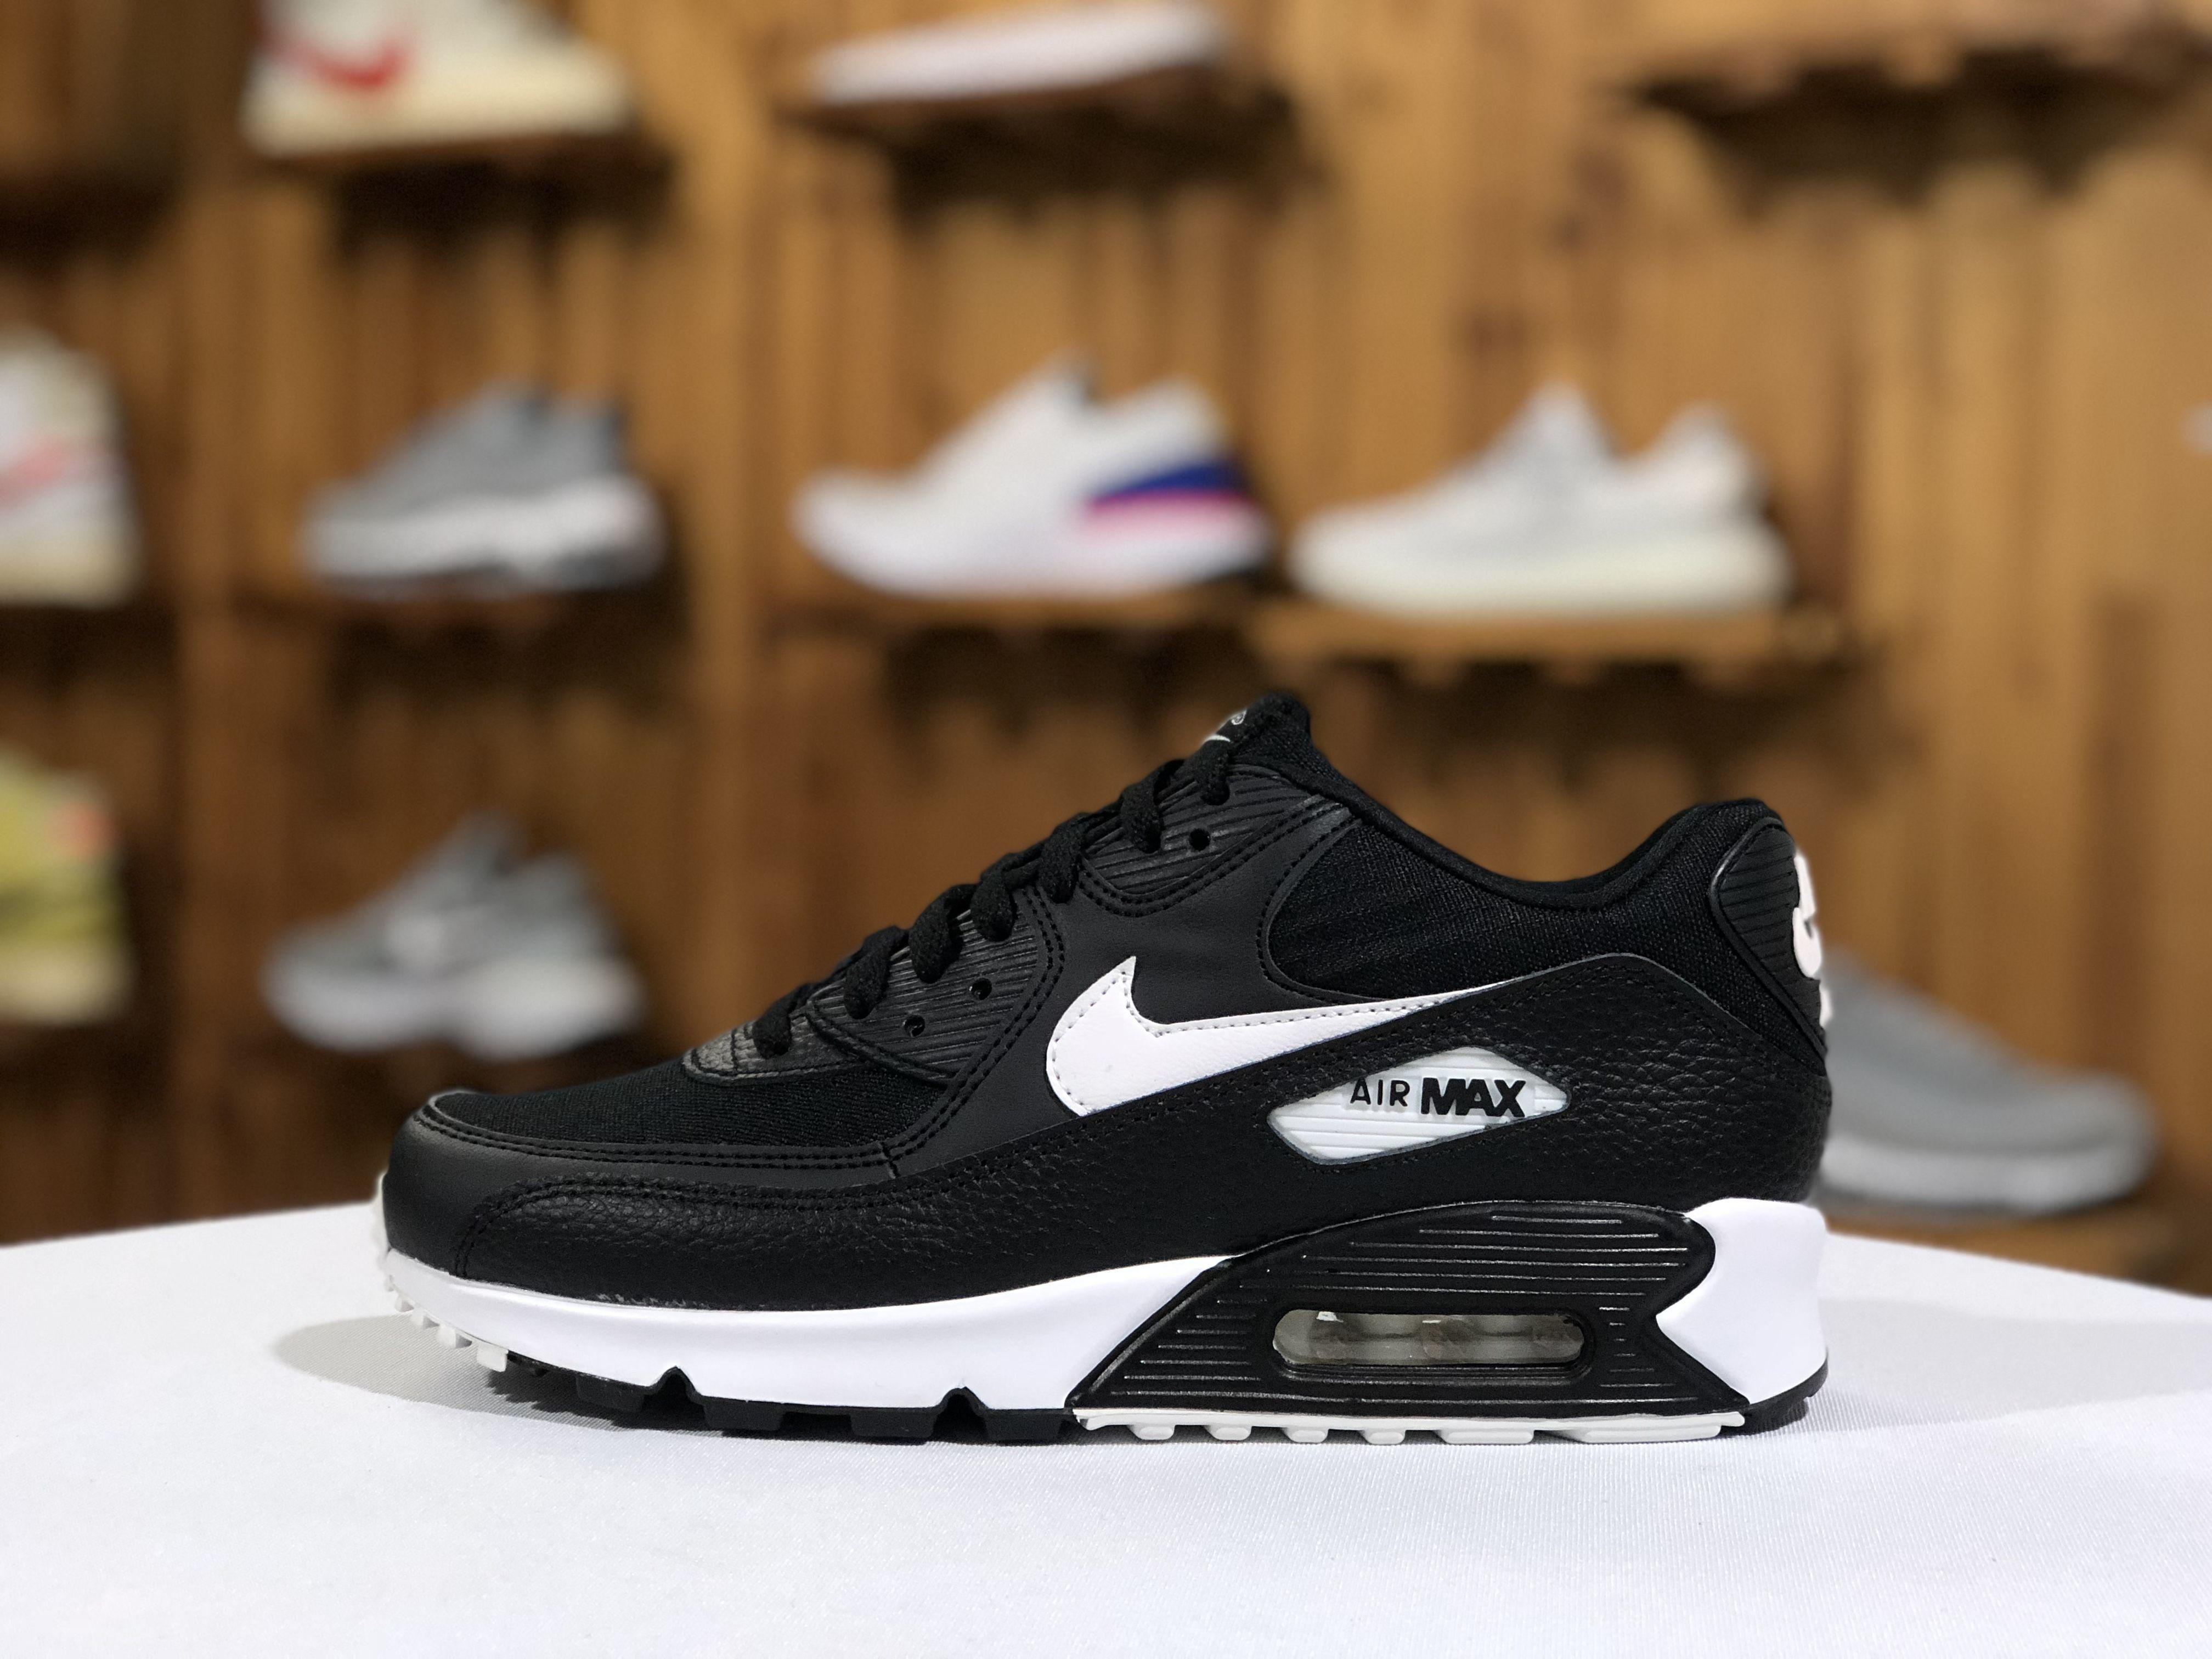 2019 Nike Air Max 90 Black White Mens Running Shoes Nike Air Max 90 Black White Nike Air Max 90 Black Nike Air Max